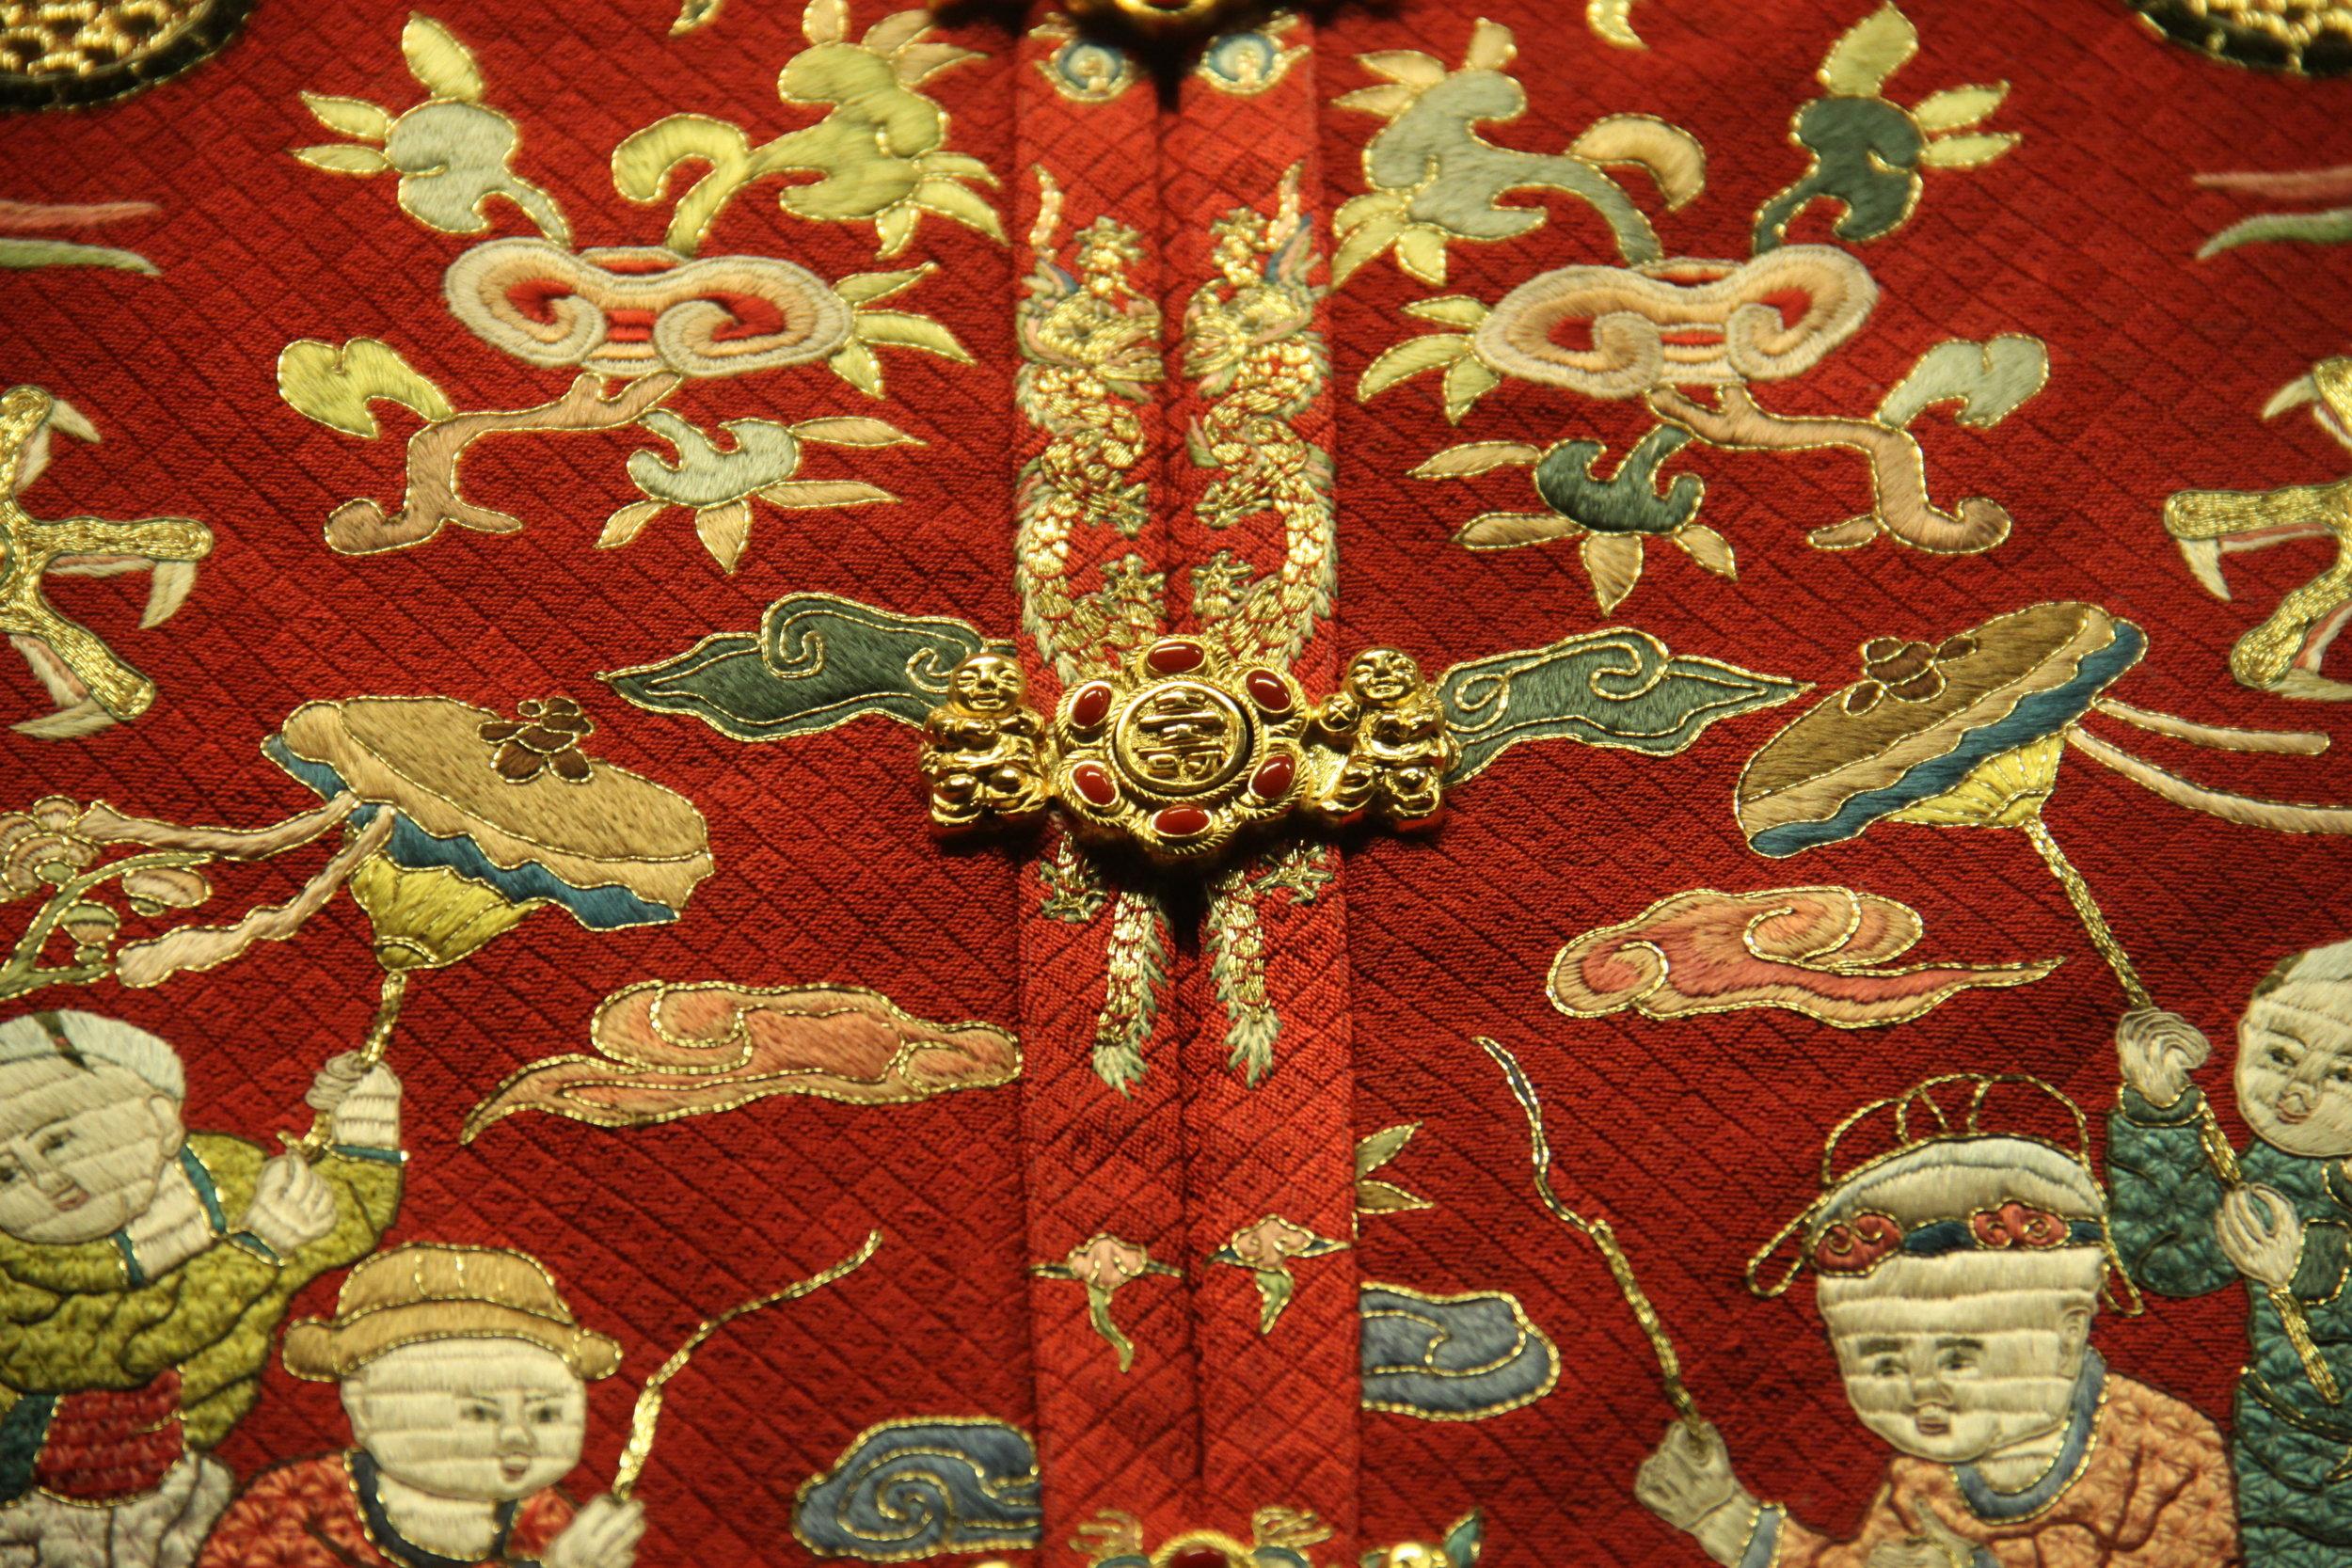 Partial of Ming Dynasty Empress' Hundred Children Jacket